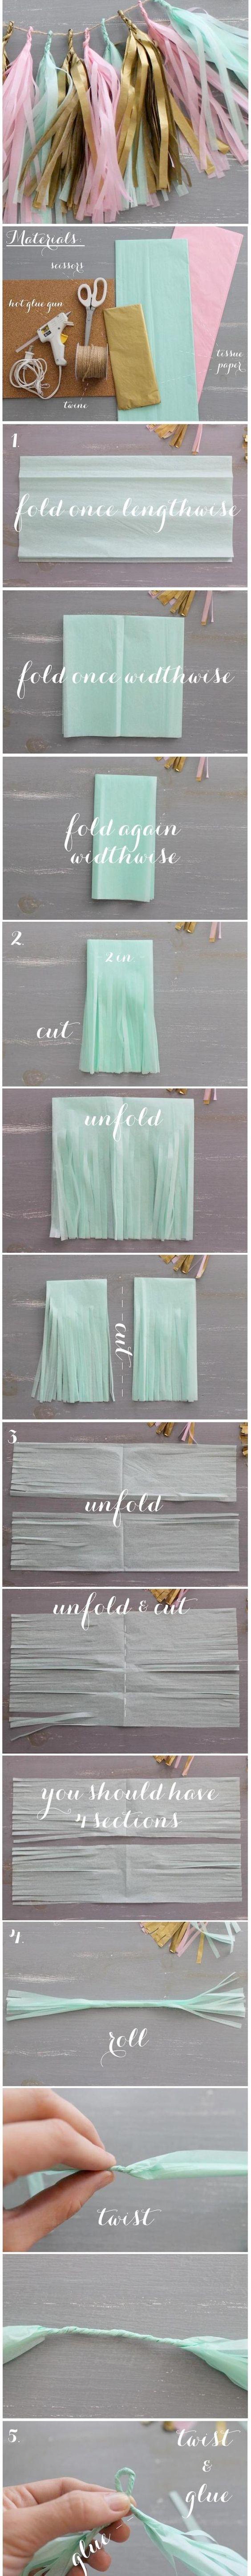 5 Easy DIY Tissue Paper Crafts